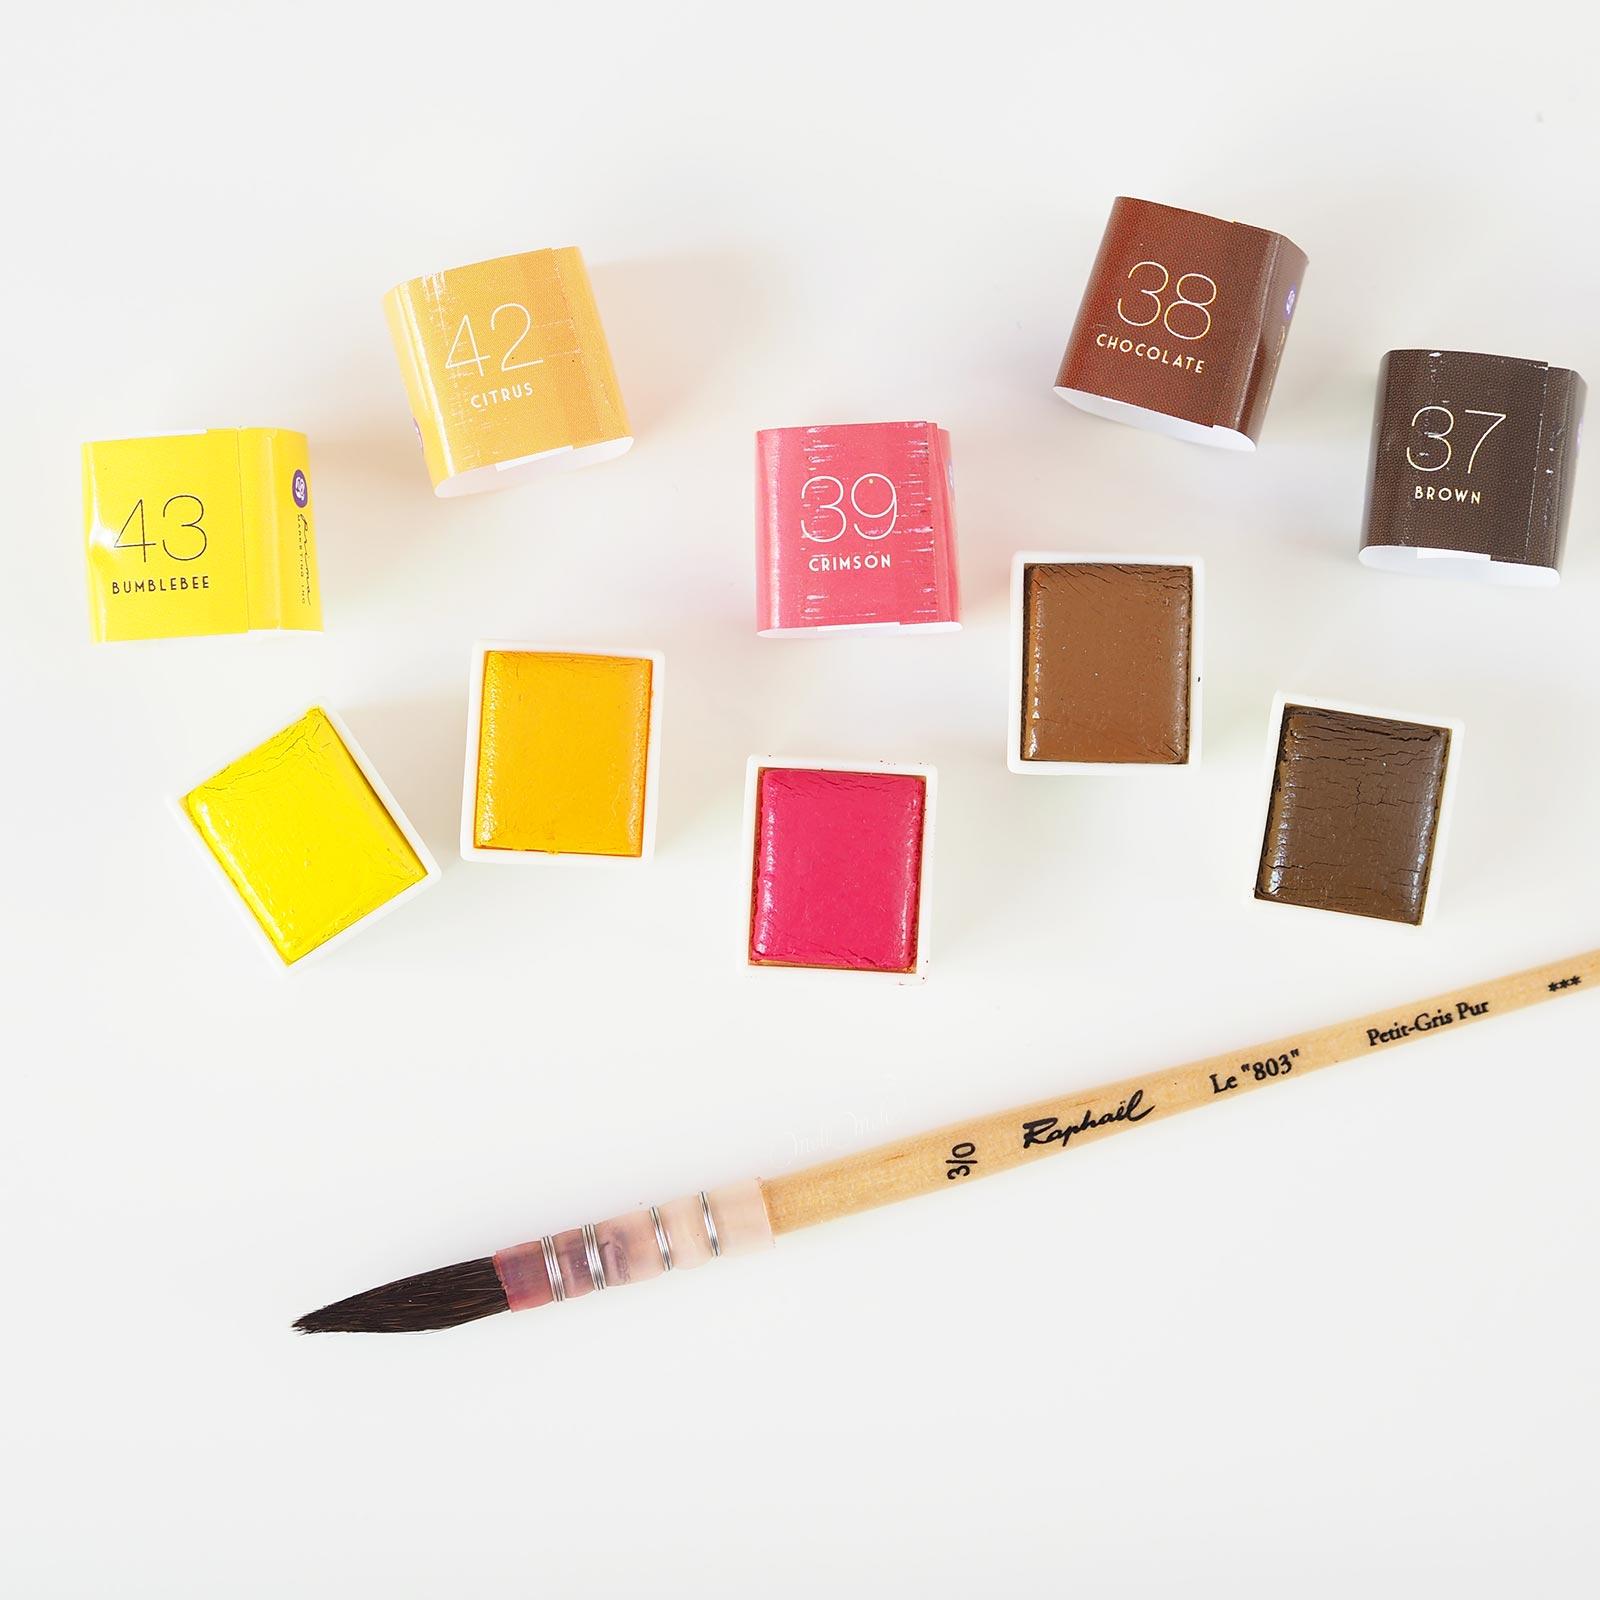 aquarelle watercolor pastel dreams 37-38-39-42-43 Prima Boutique MeliMelo